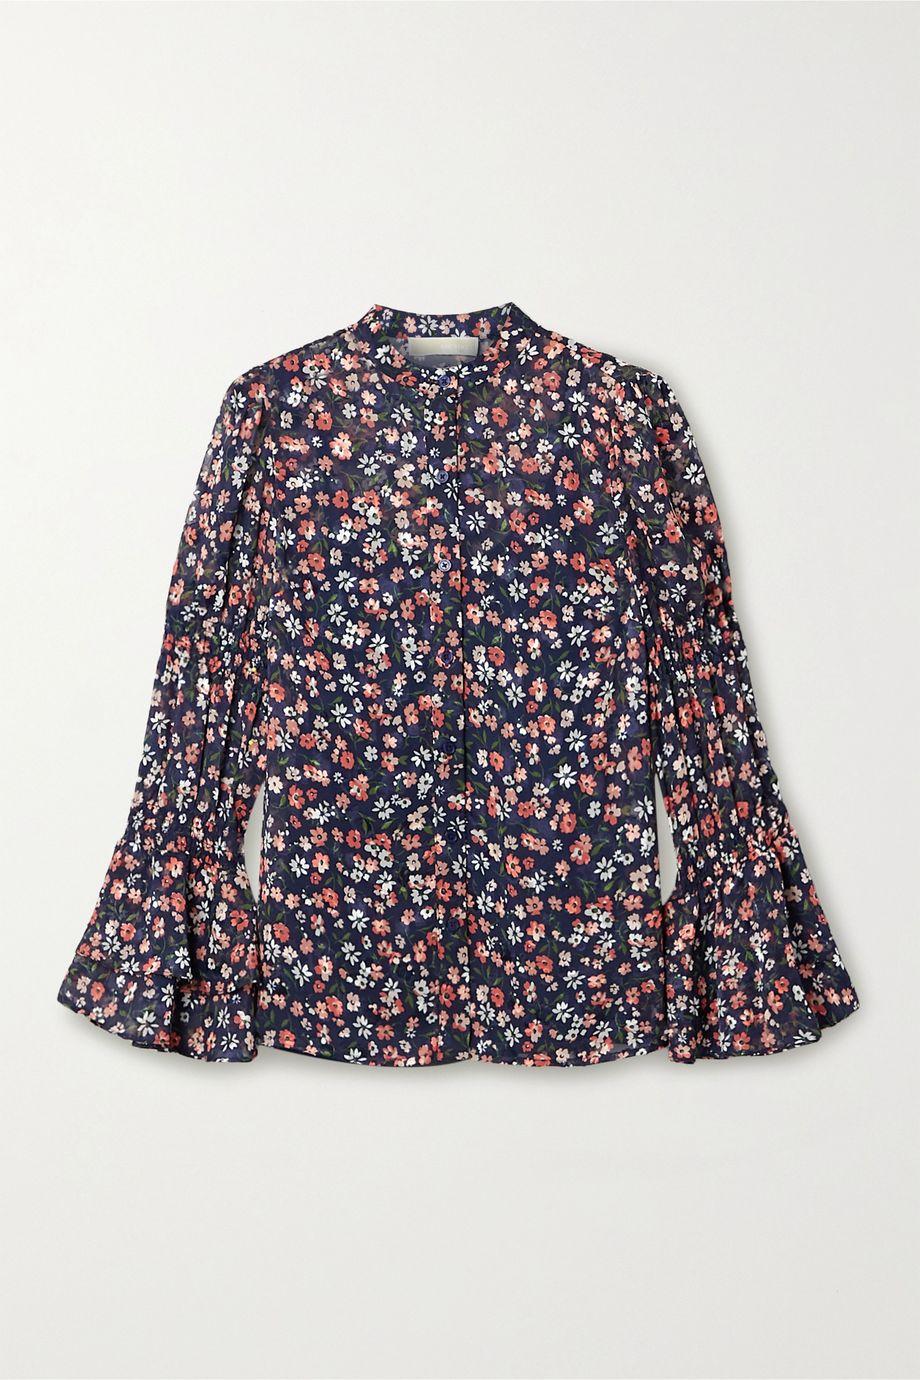 MICHAEL Michael Kors Garden Patch Bluse aus Crêpe mit Blumenprint